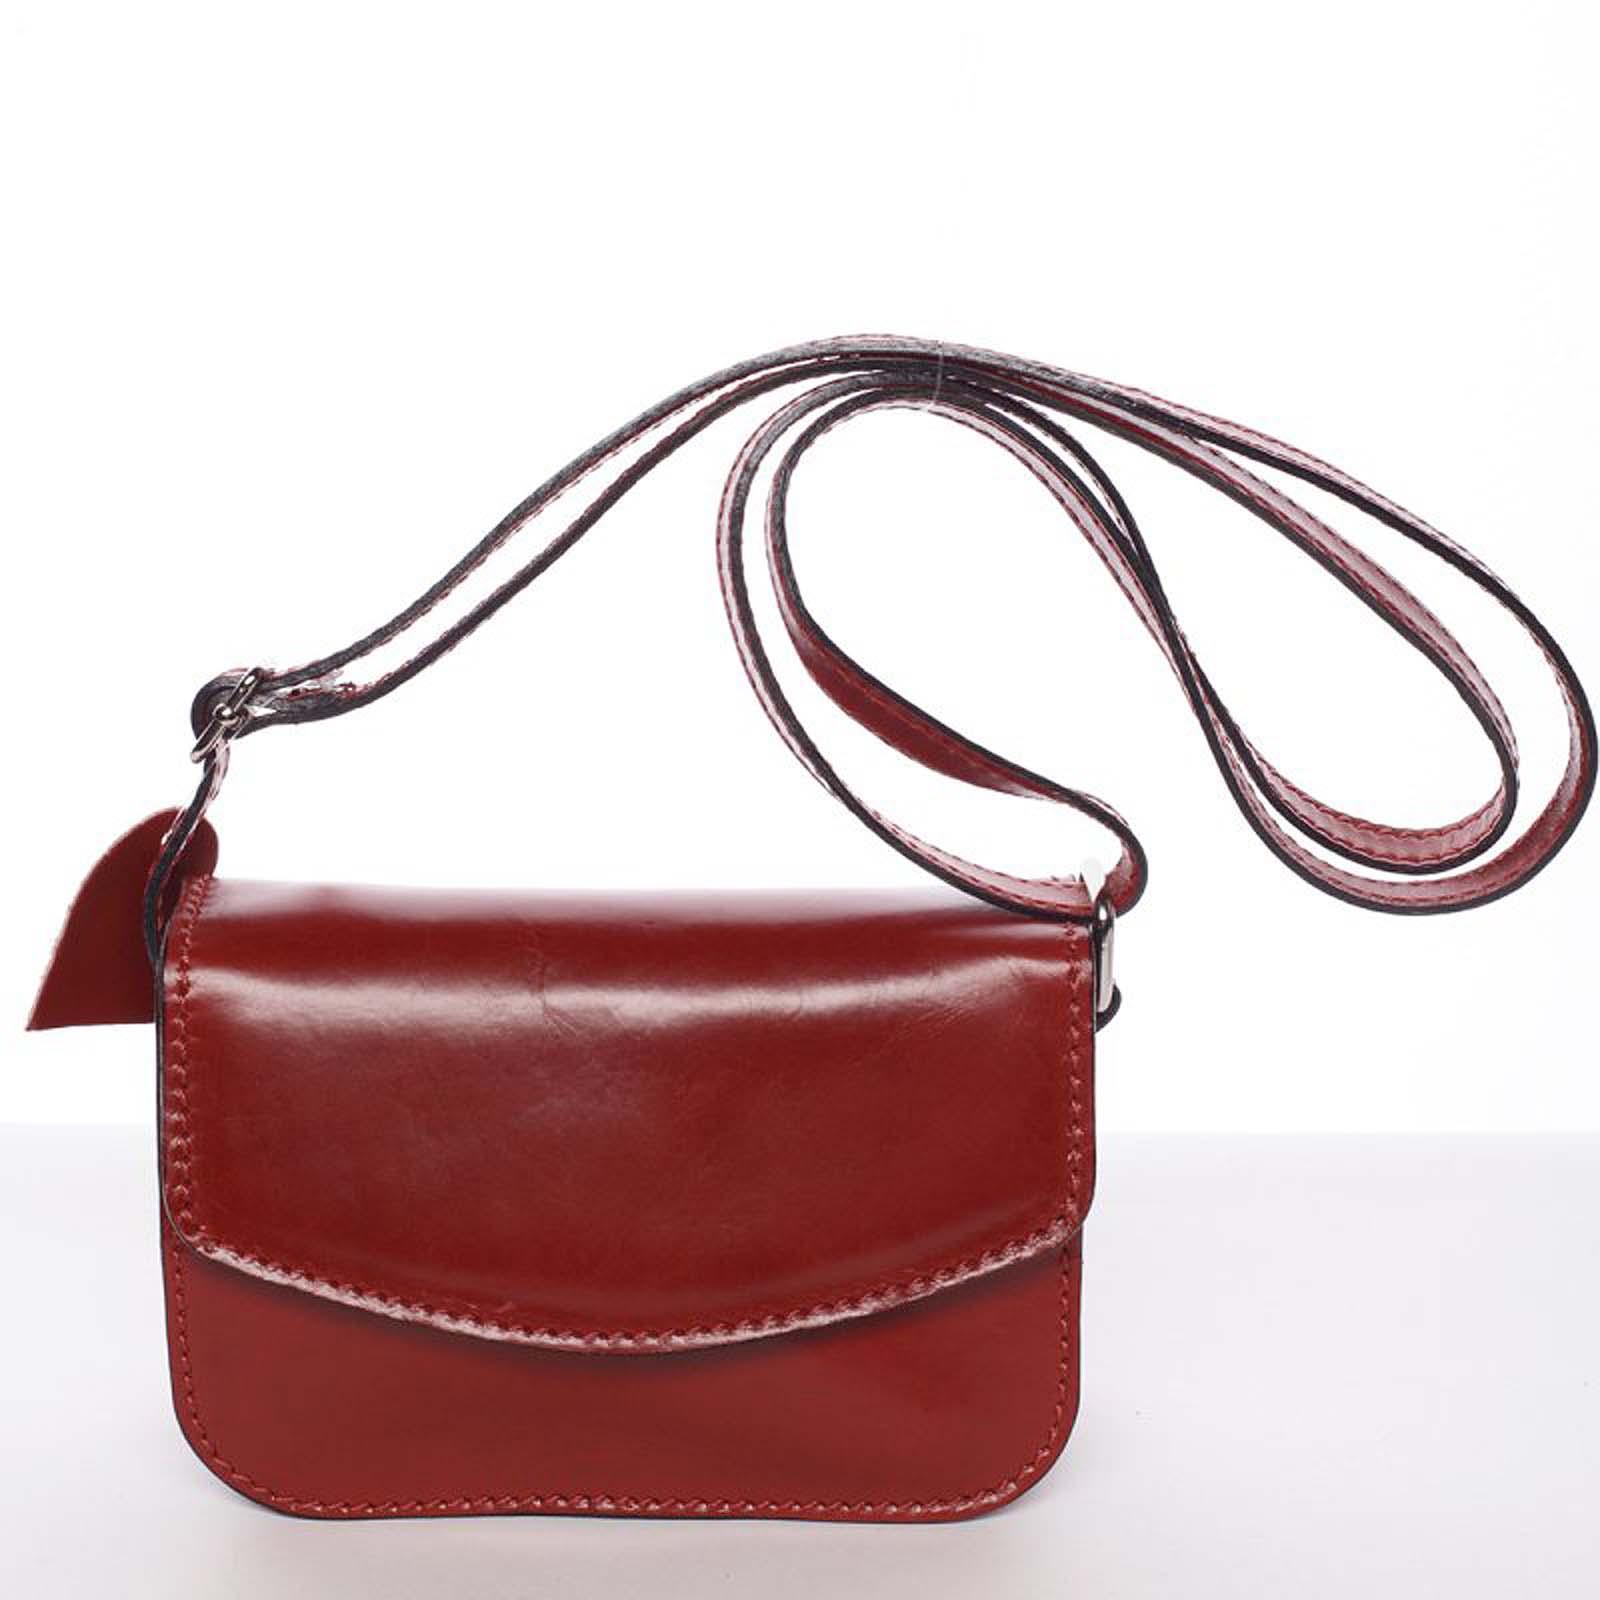 Malá kožená dámska crossbody kabelka červená - ItalY Paulina